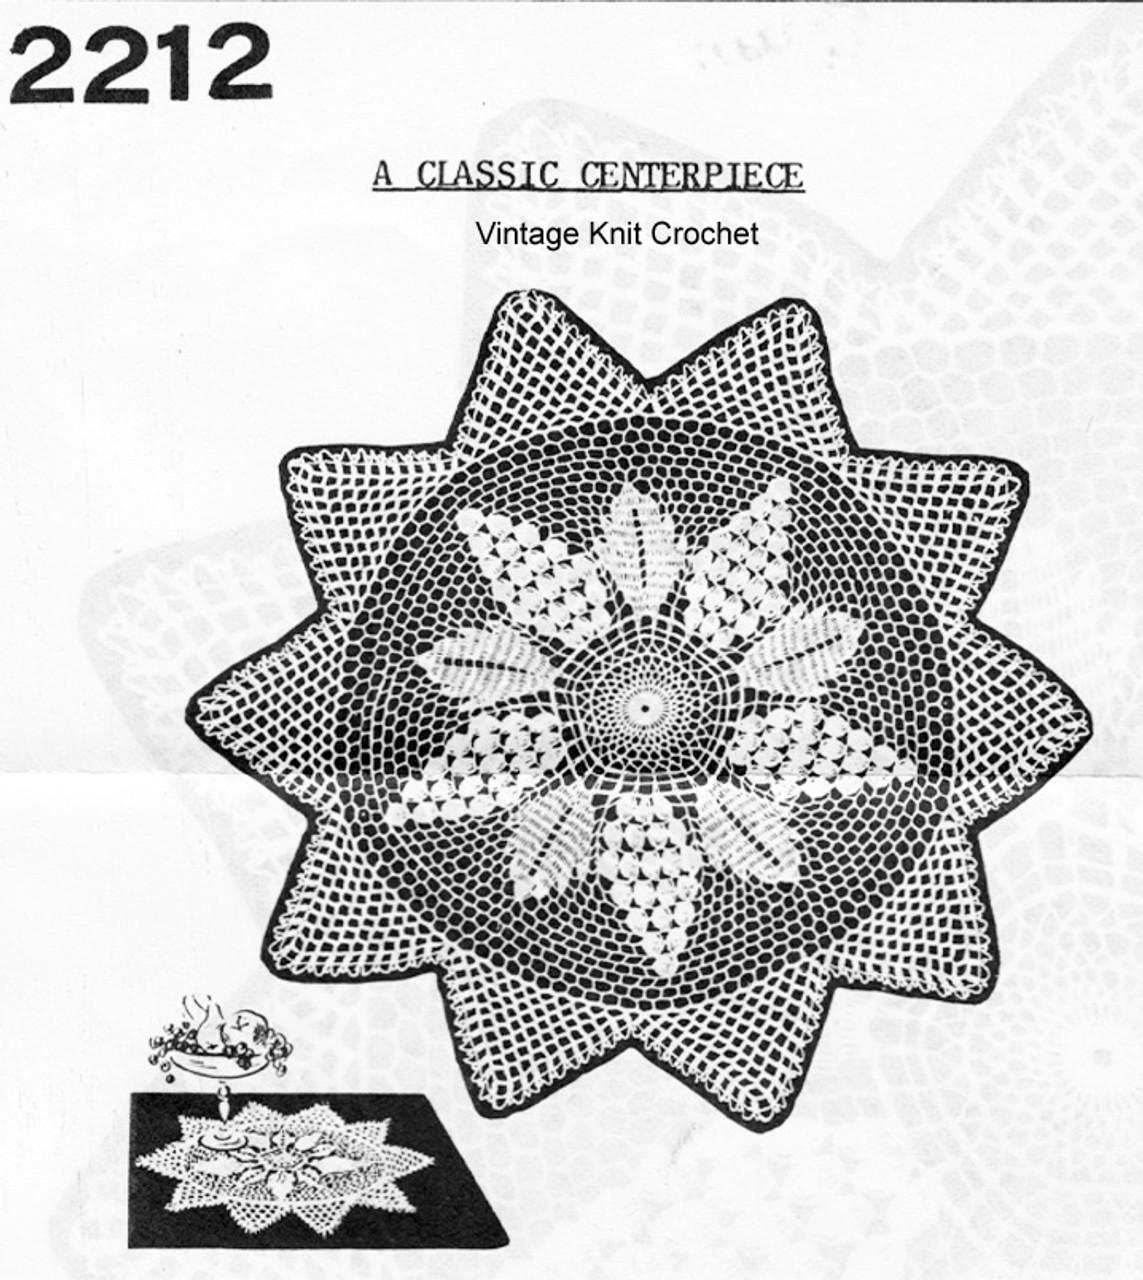 Crocheted Gape Doily pattern, Sun Motif, Mail Order 2212